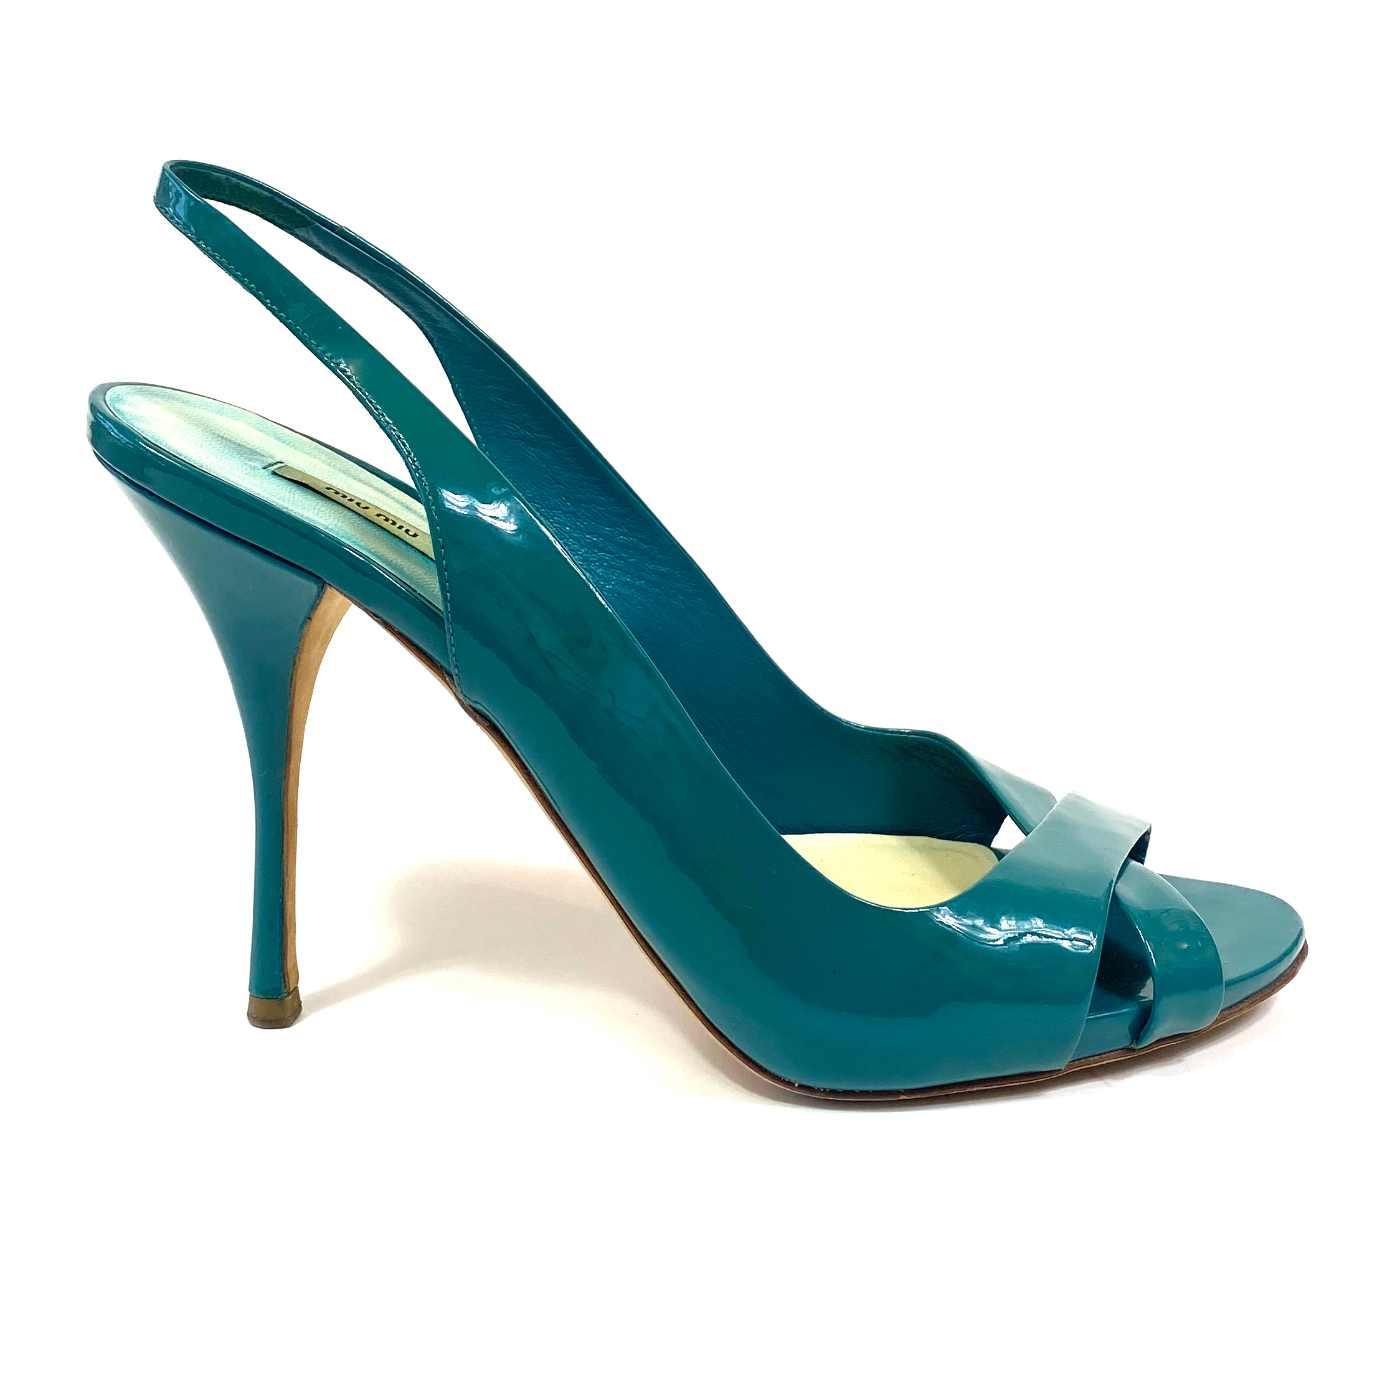 Sapato Peep Toe Miu Miu Verniz Turquesa